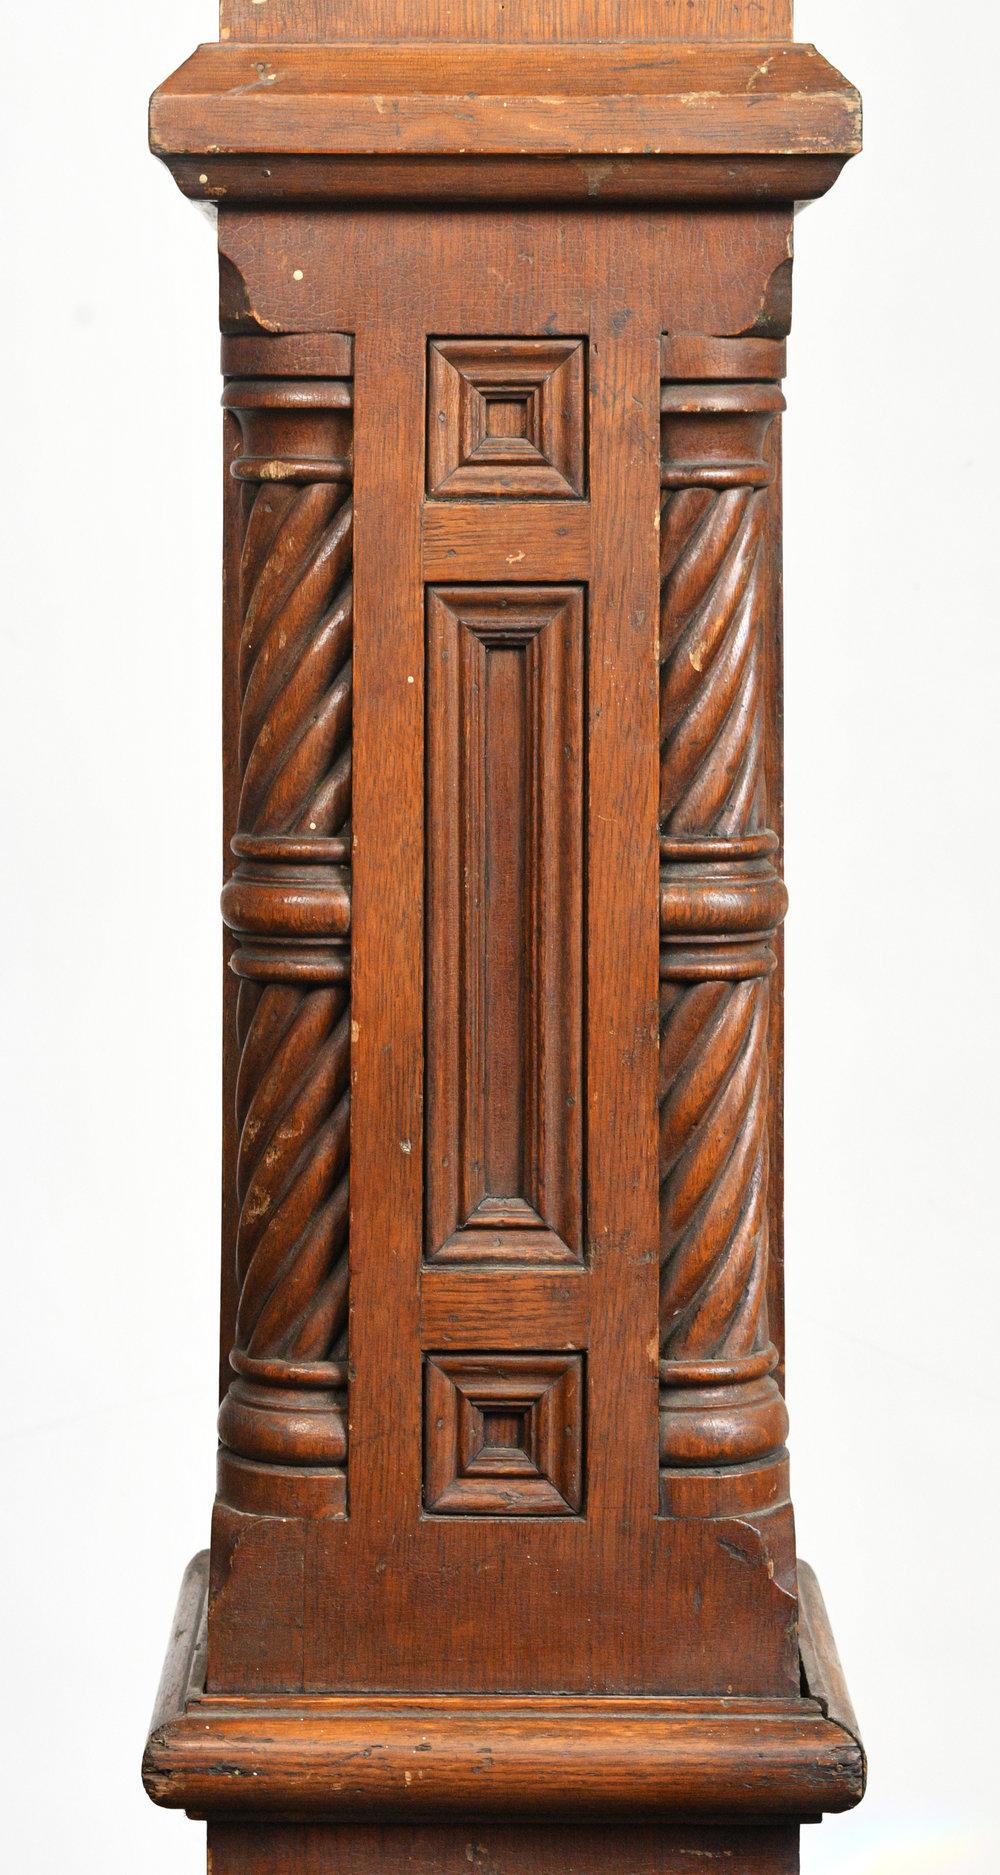 47717-victorian-carved-oak-newel-post-26.jpg